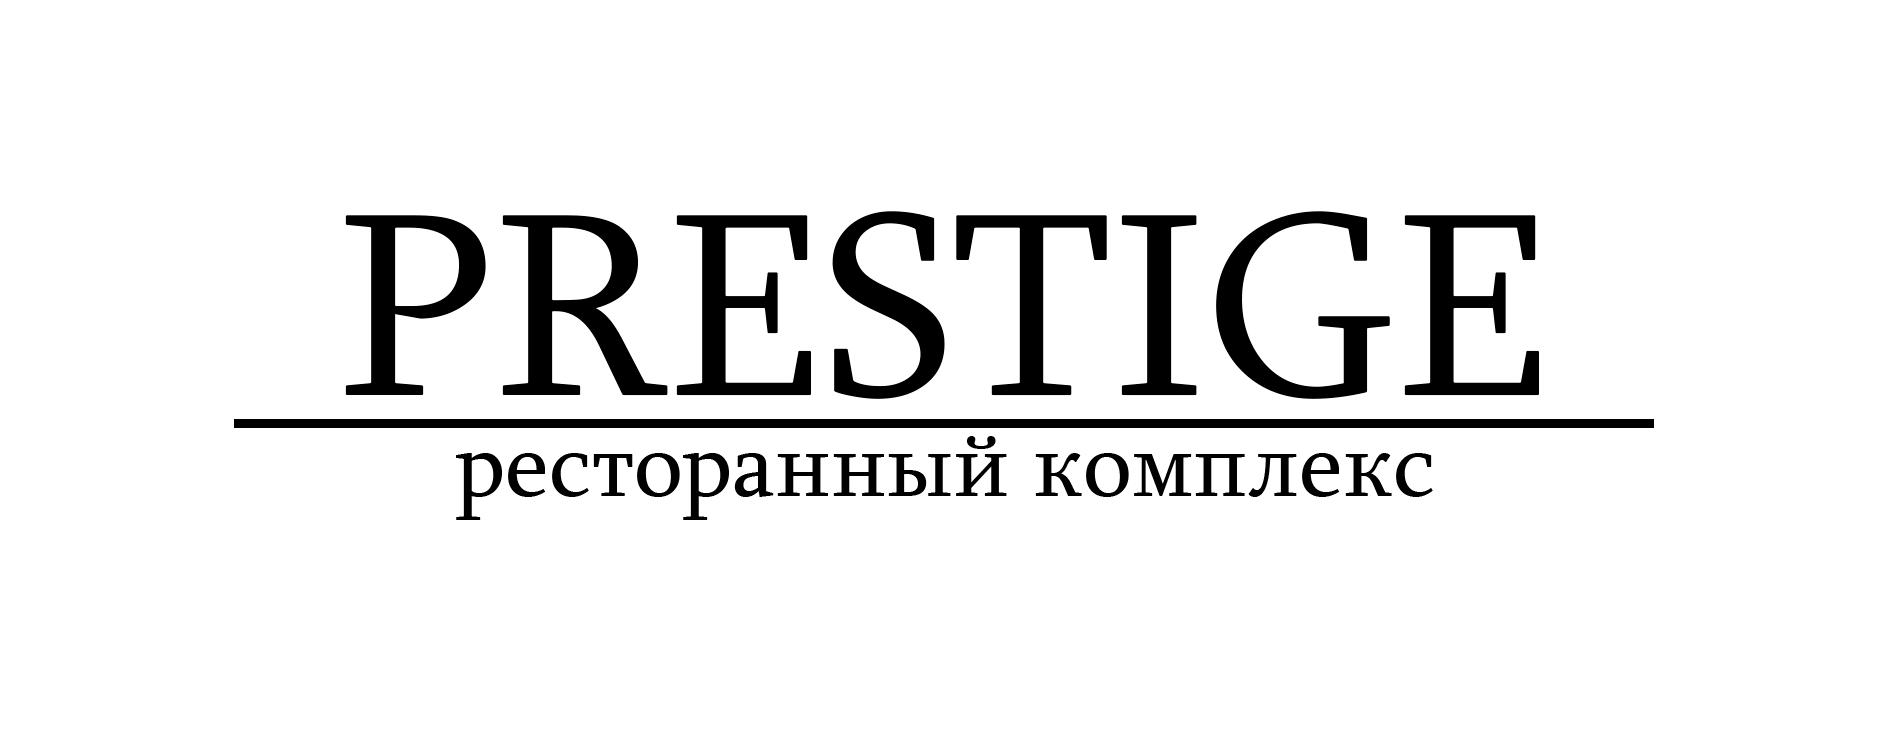 (c) Prestig.org